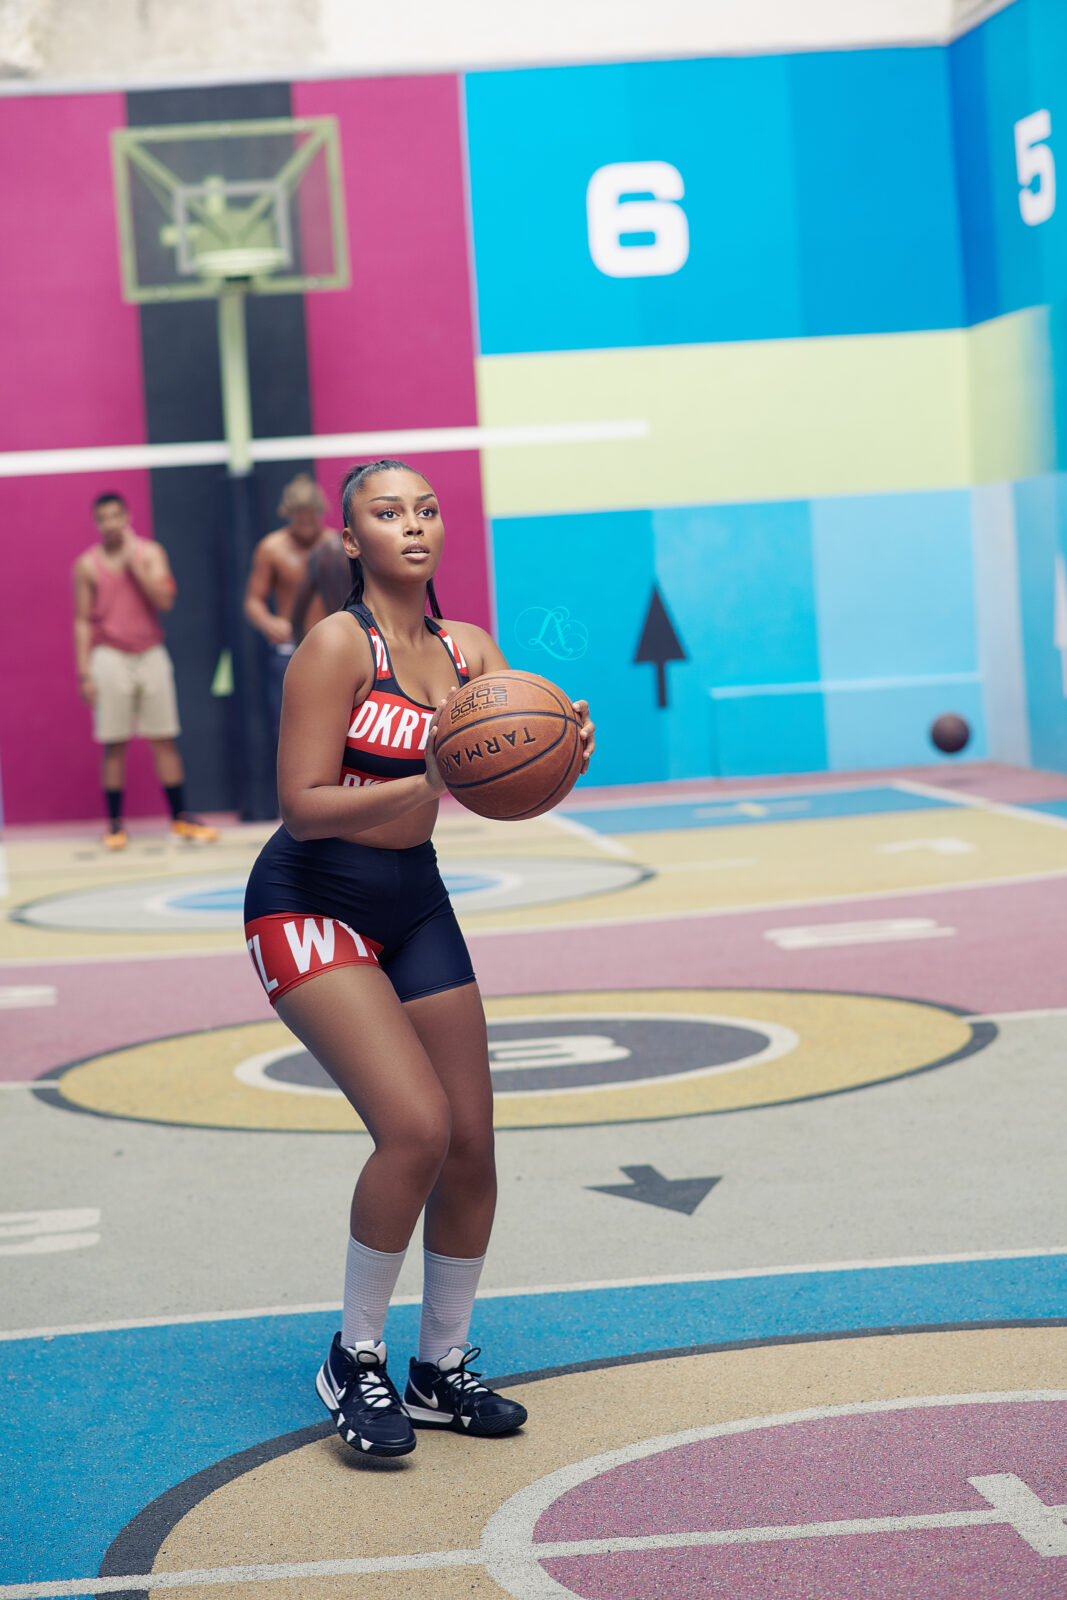 Une basketteuse talentueuse.